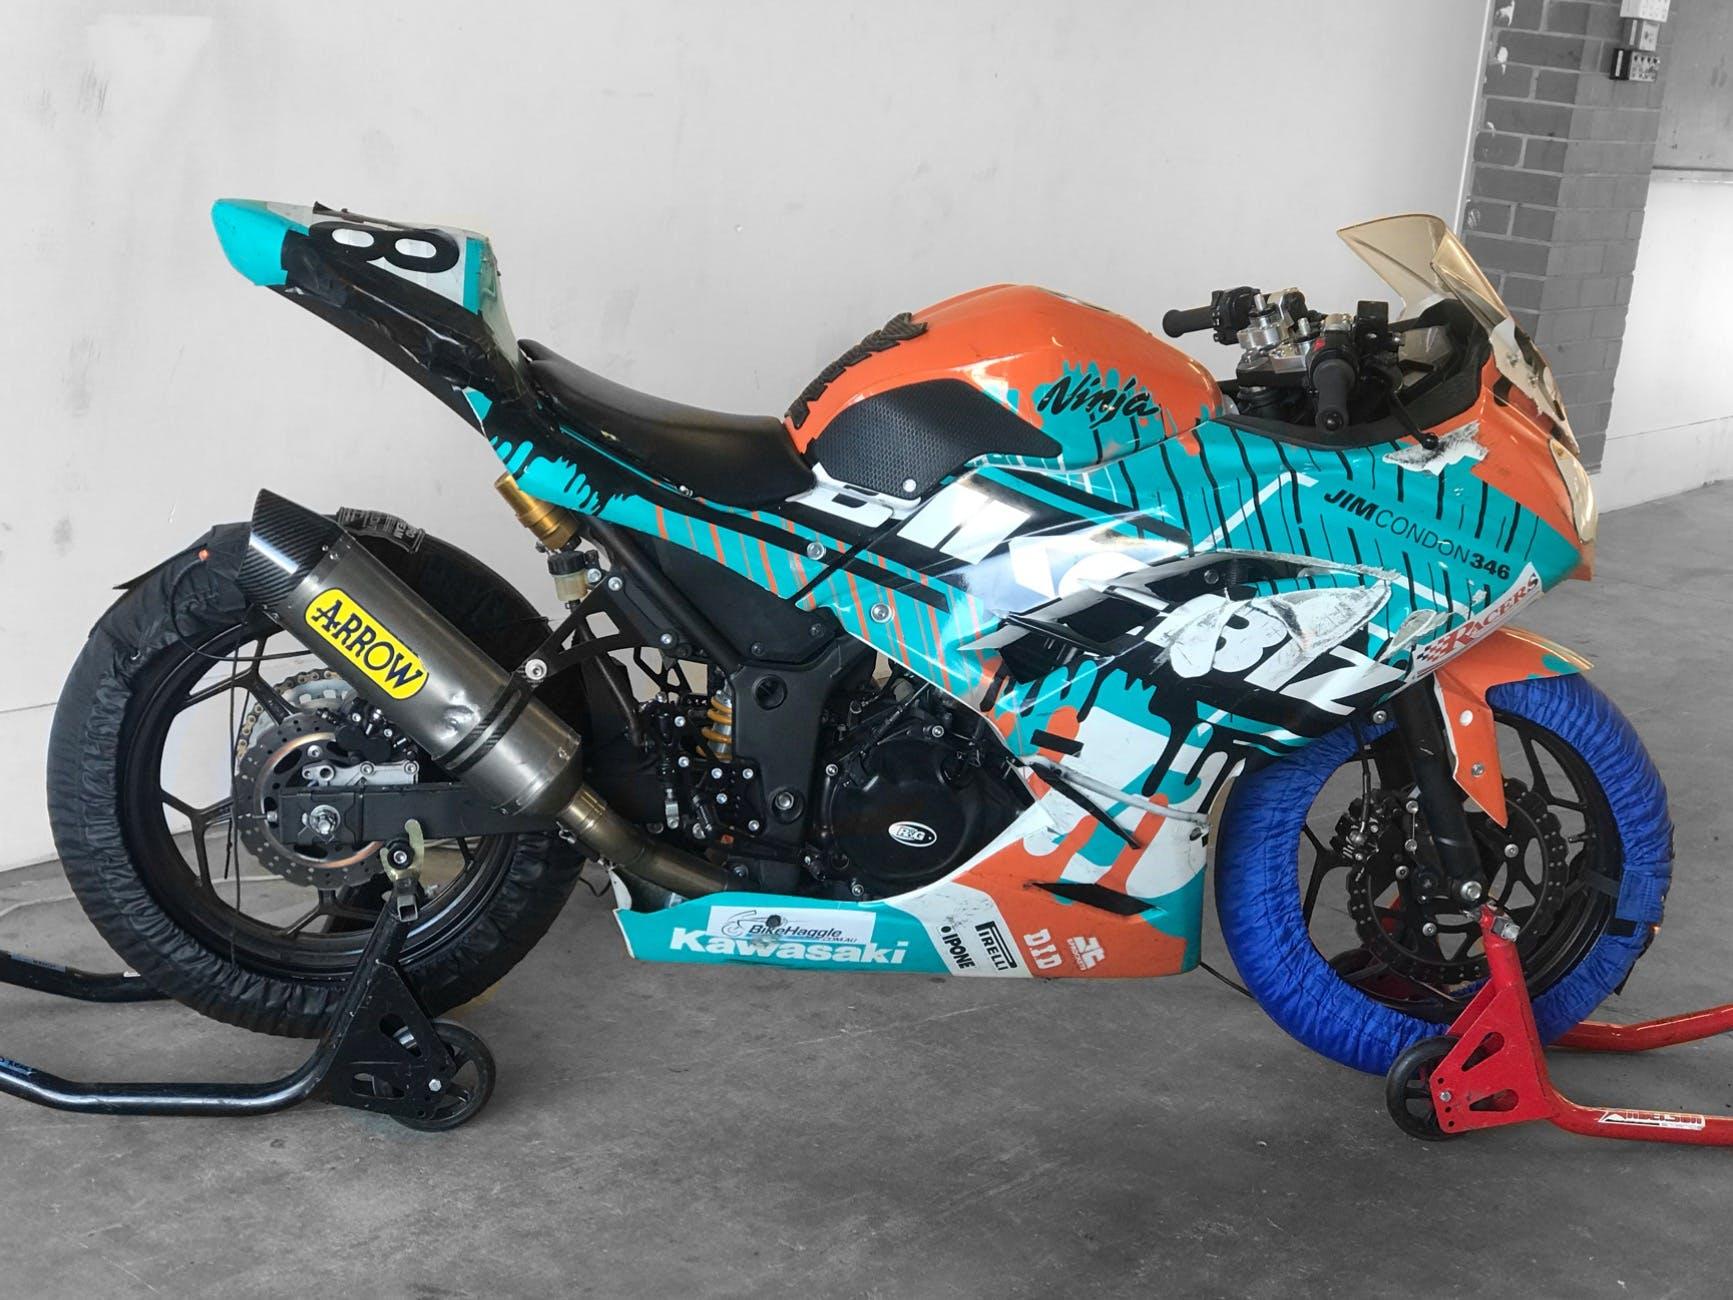 A blue and orange race Kawasaki Ninja 300 motorcycle